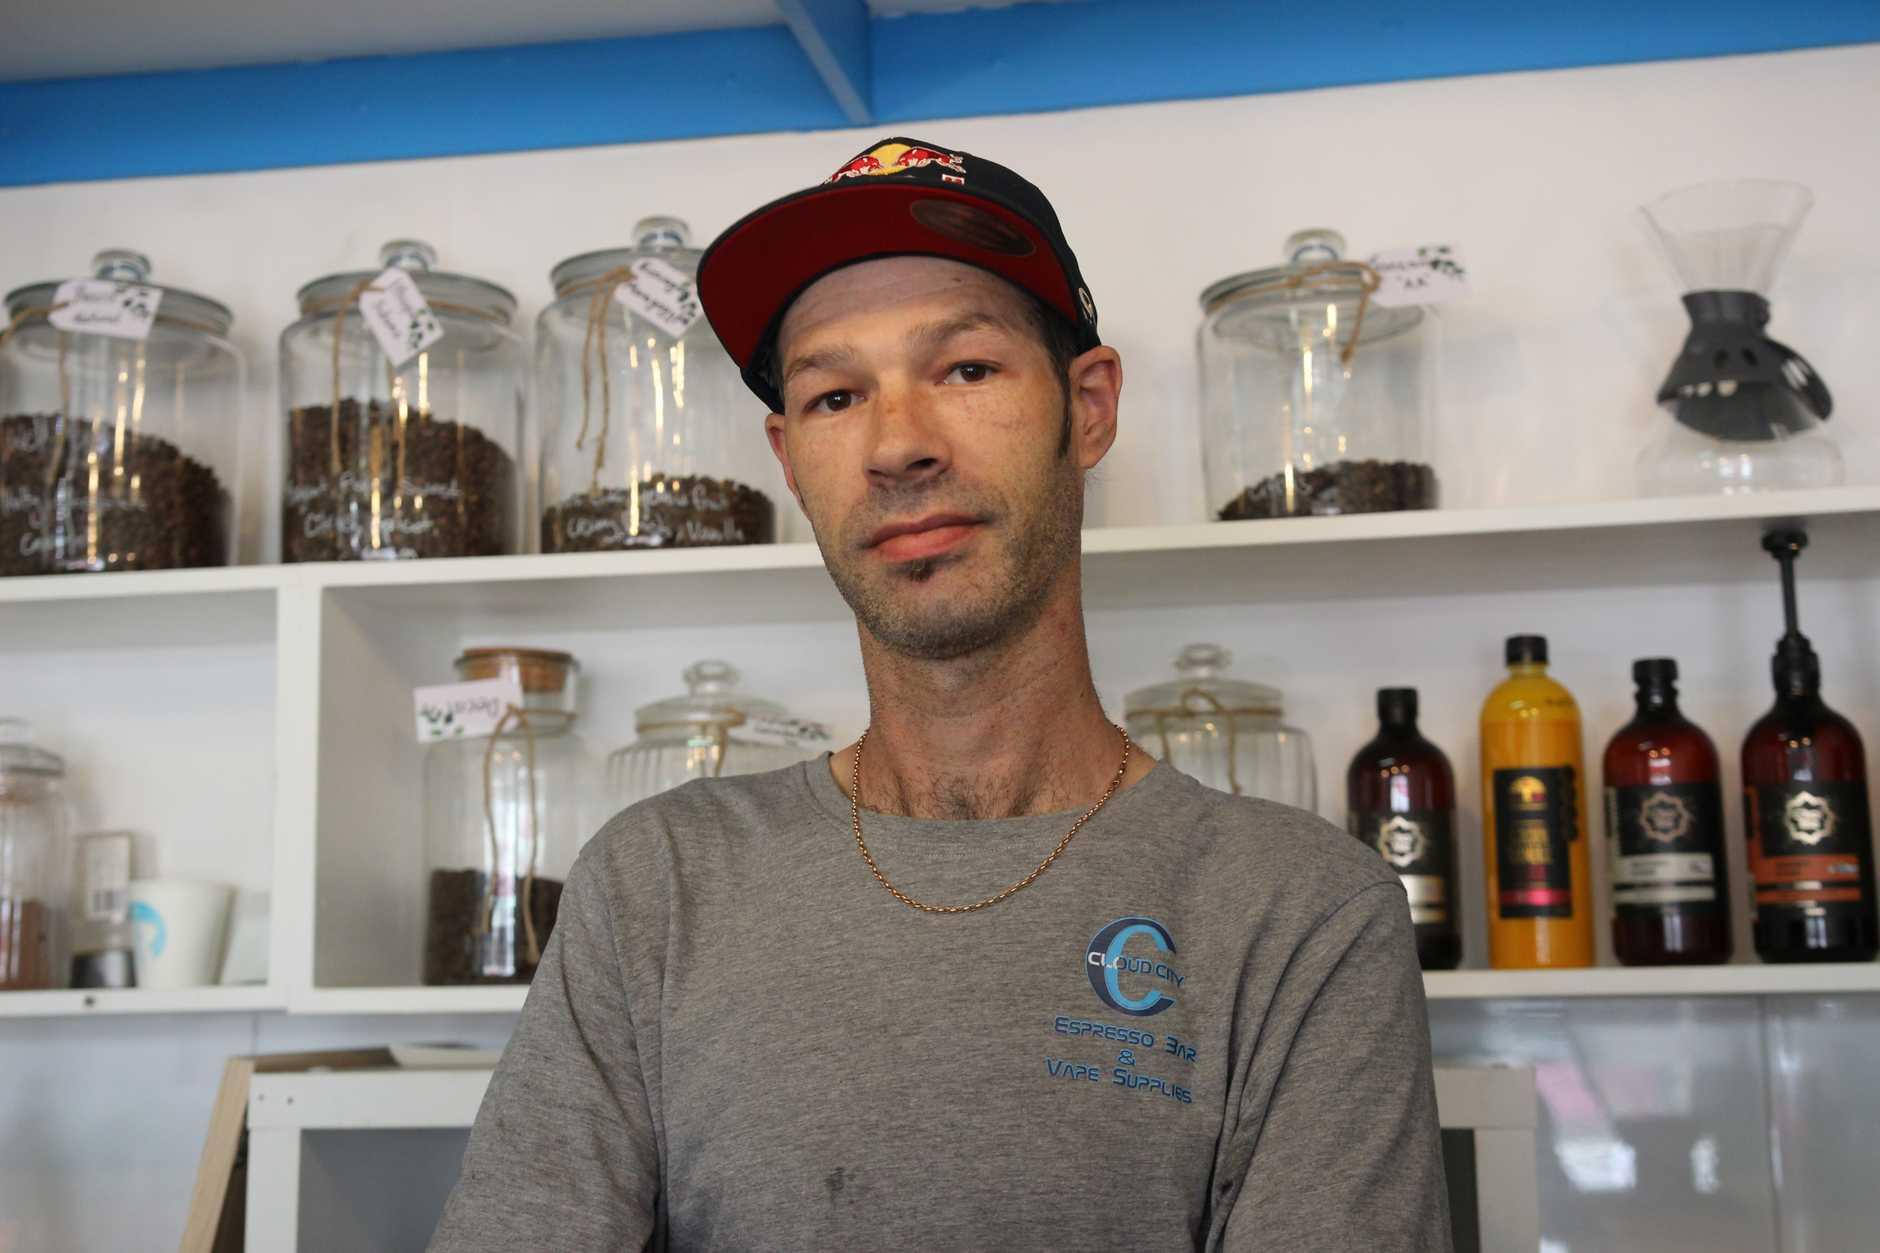 Coffs Harbour's Luke Graham runs Cloud City Coffee and Vape.